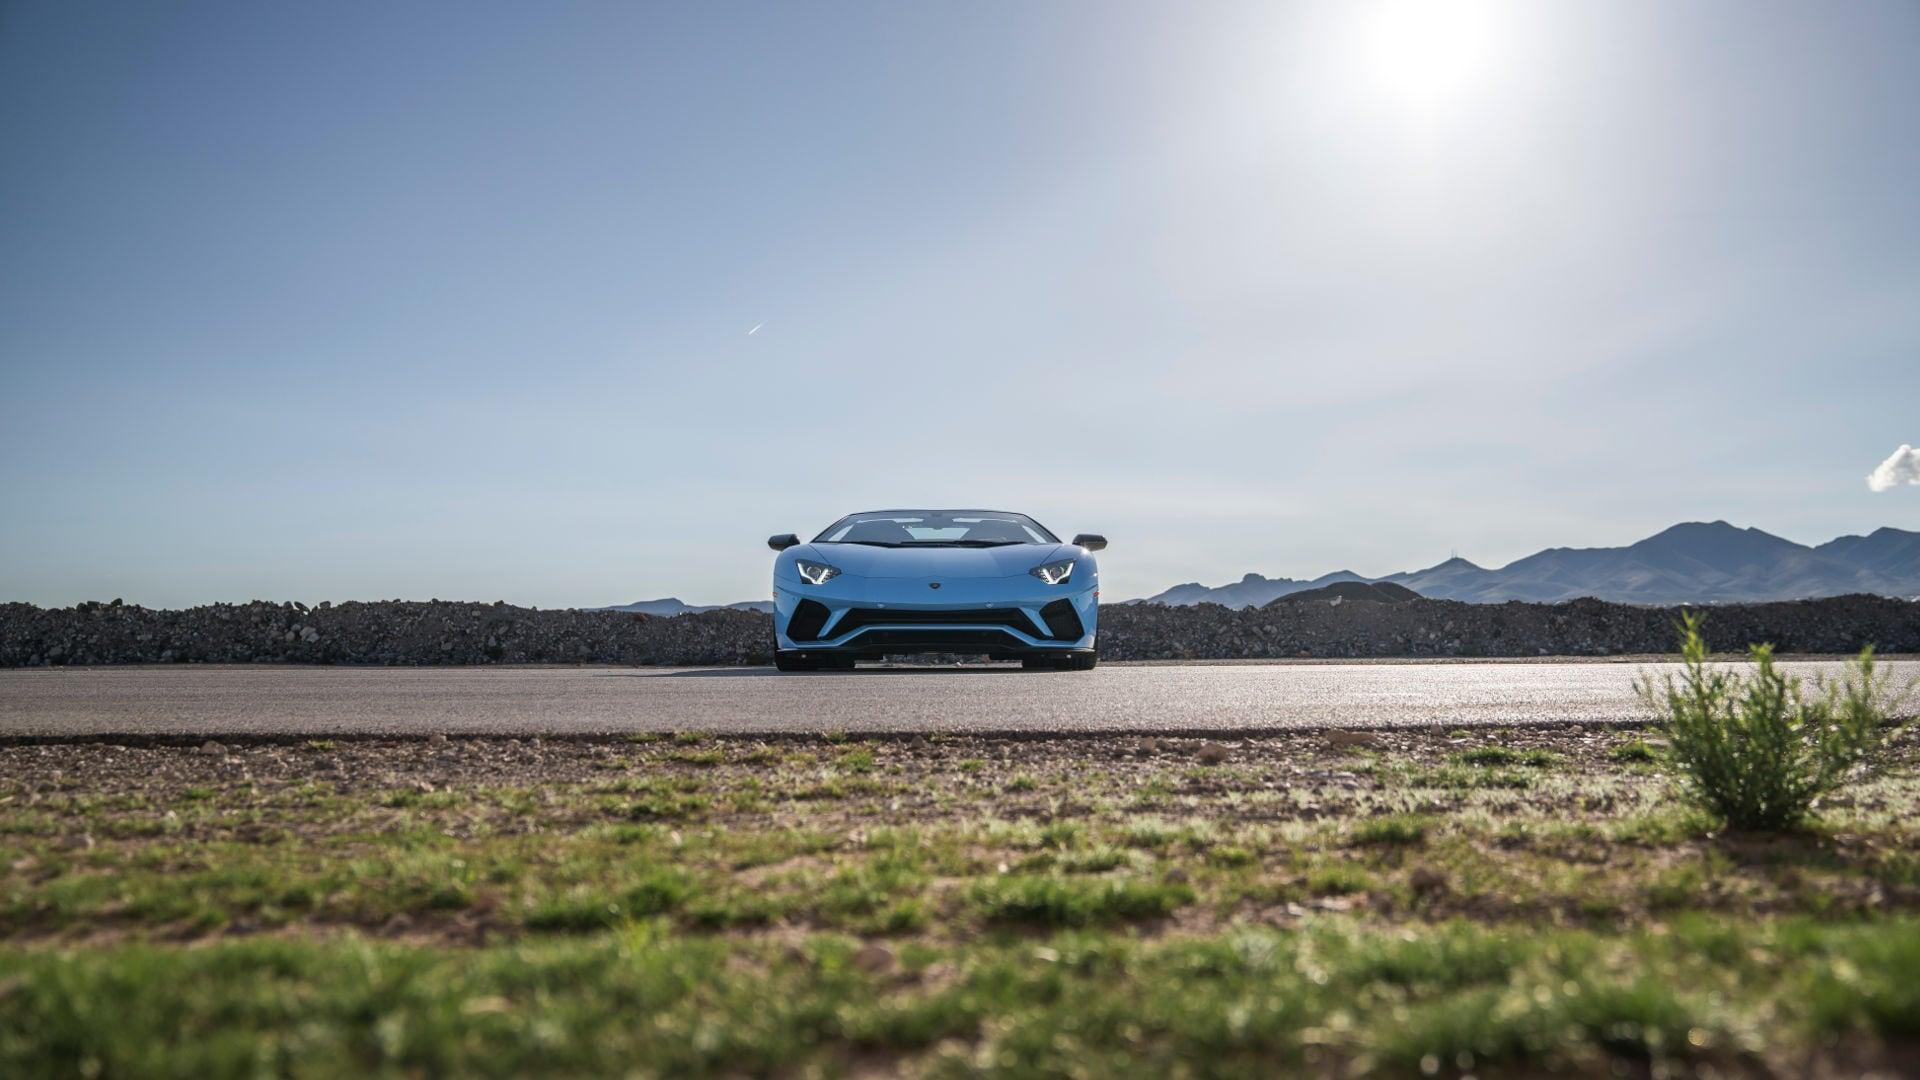 Lamborghini Countach Ultimate Waterproof Full Car Cover